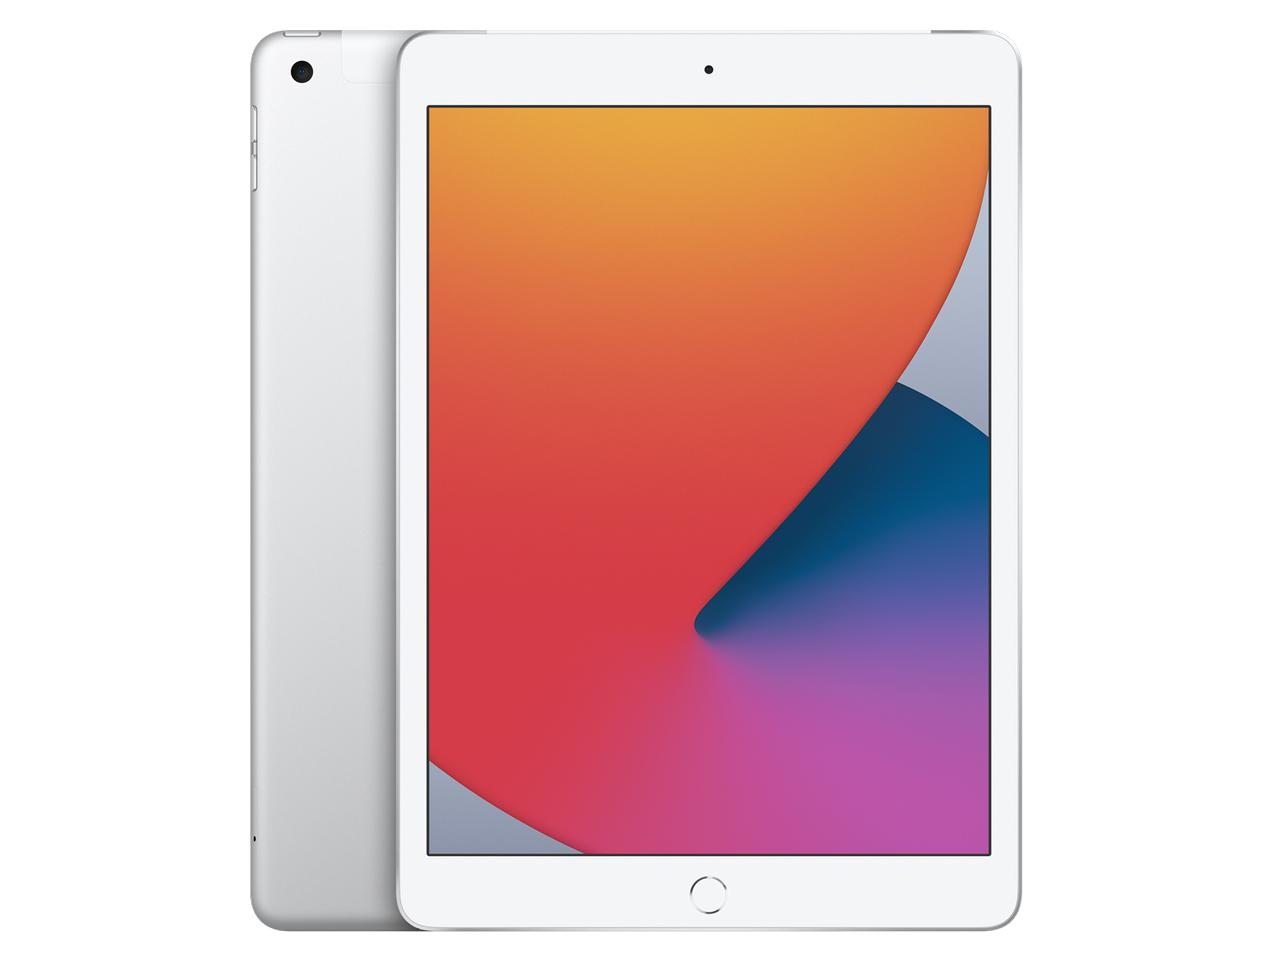 iPad 10.2インチ 第8世代 Wi-Fi+Cellular 32GB 2020年秋モデル au の製品画像